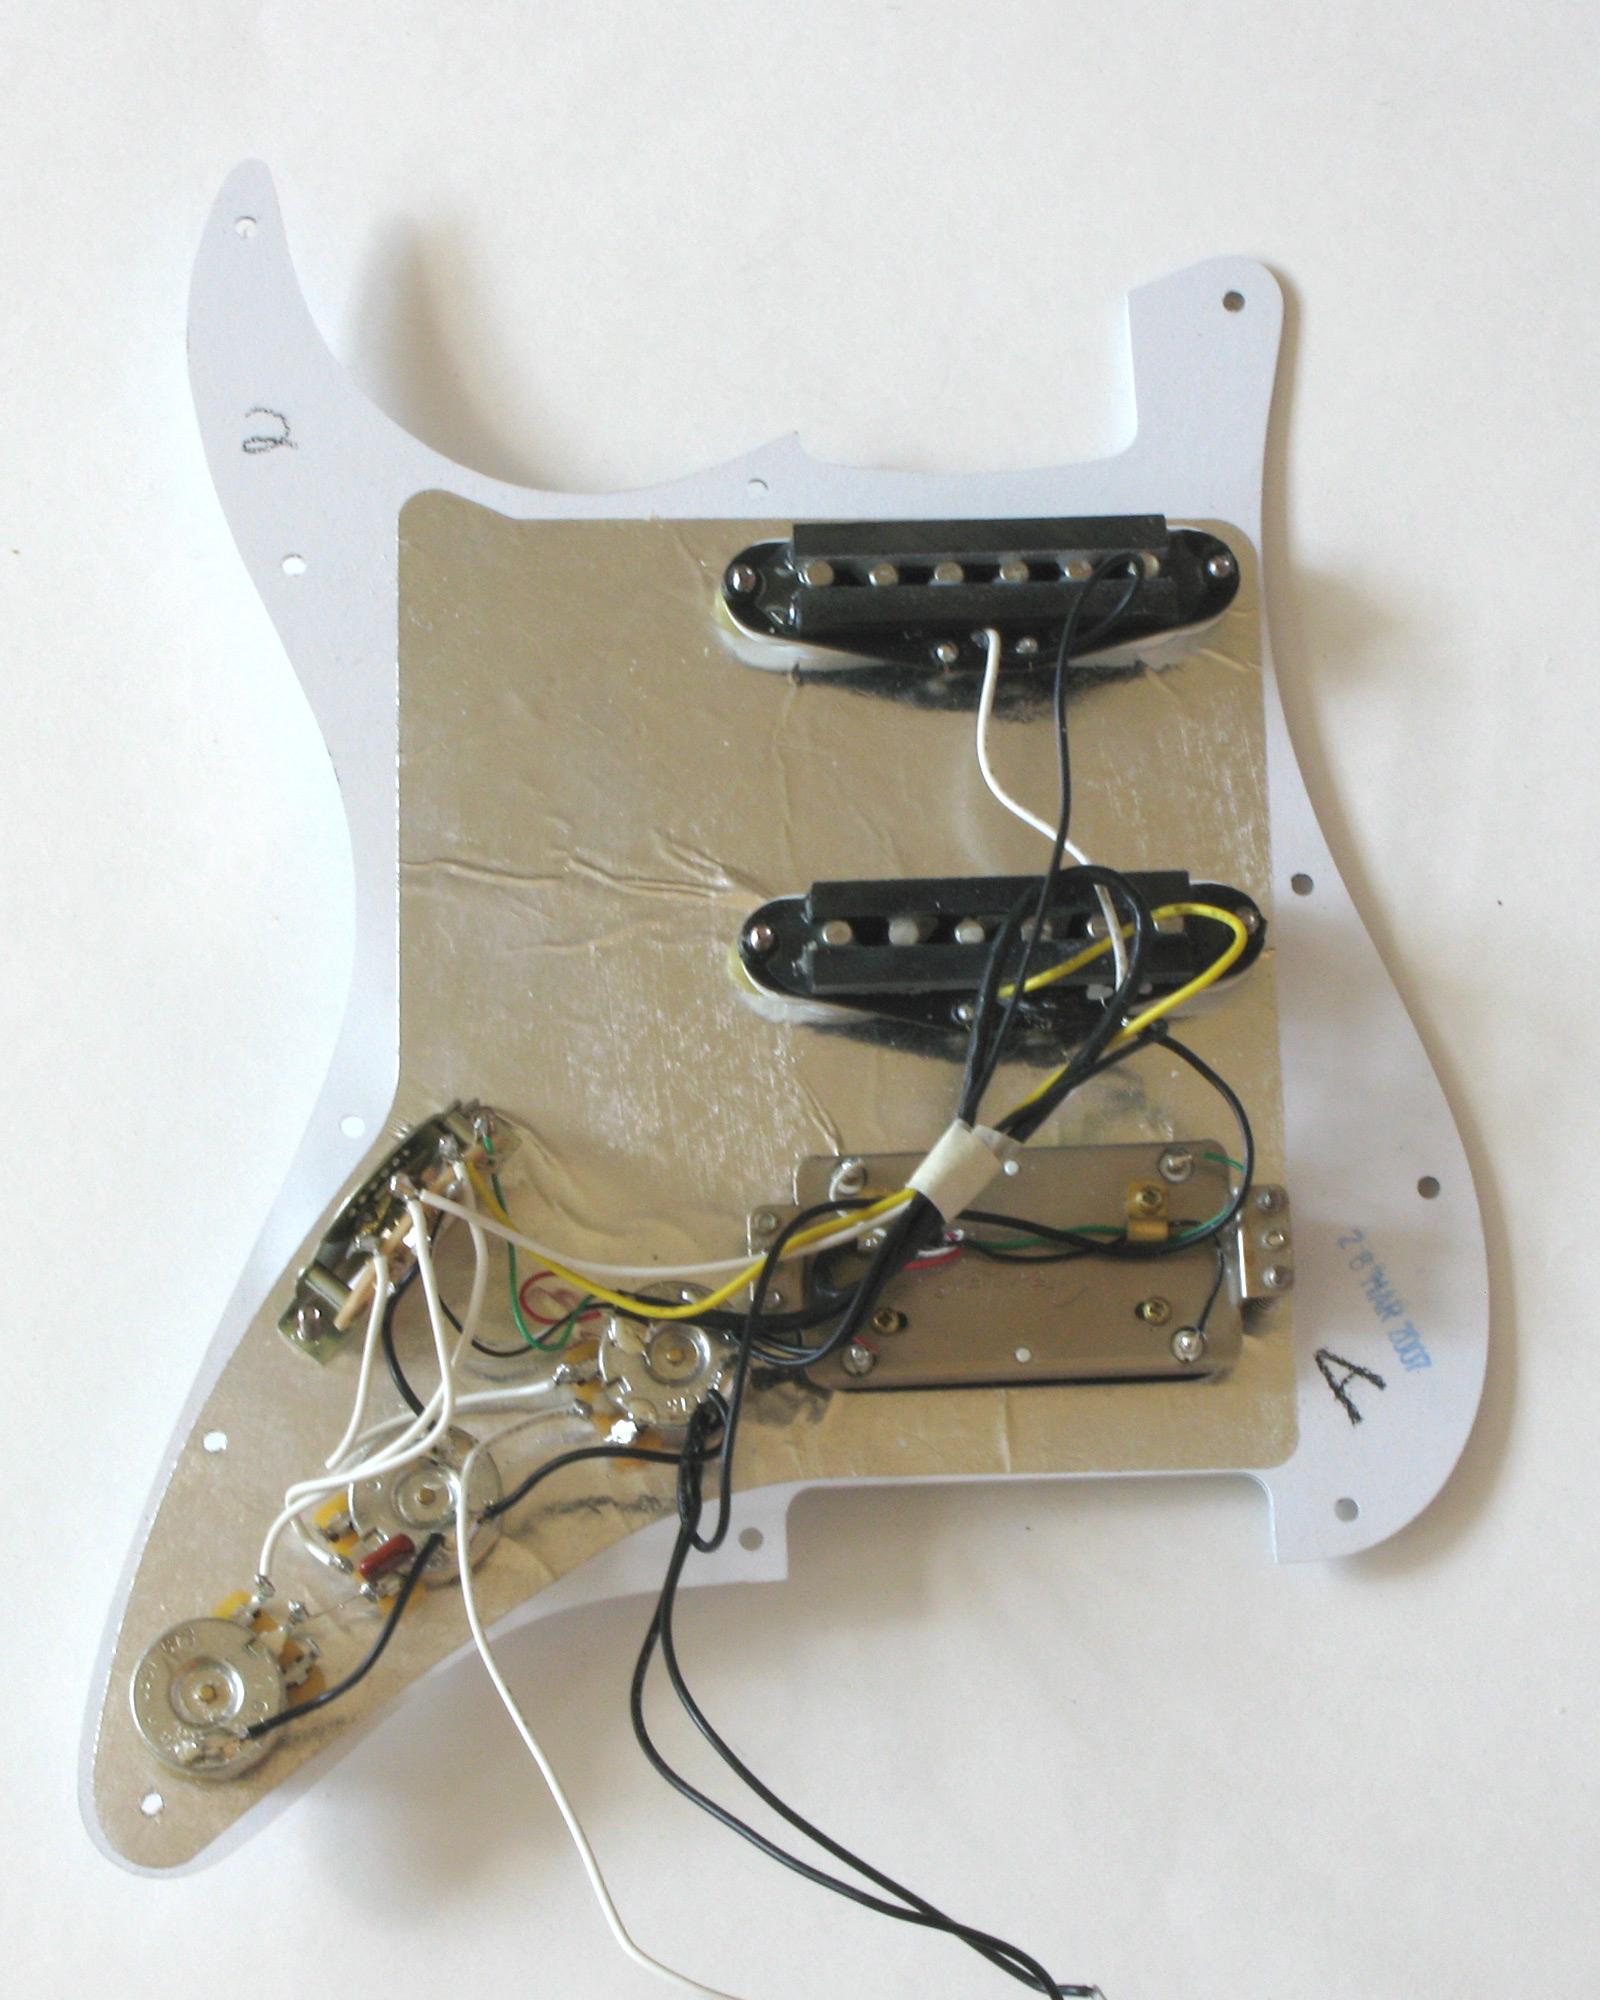 Fender Stratocaster Mexican Hss Pickguard Wiring Diagram - Fender Strat Wiring Diagram